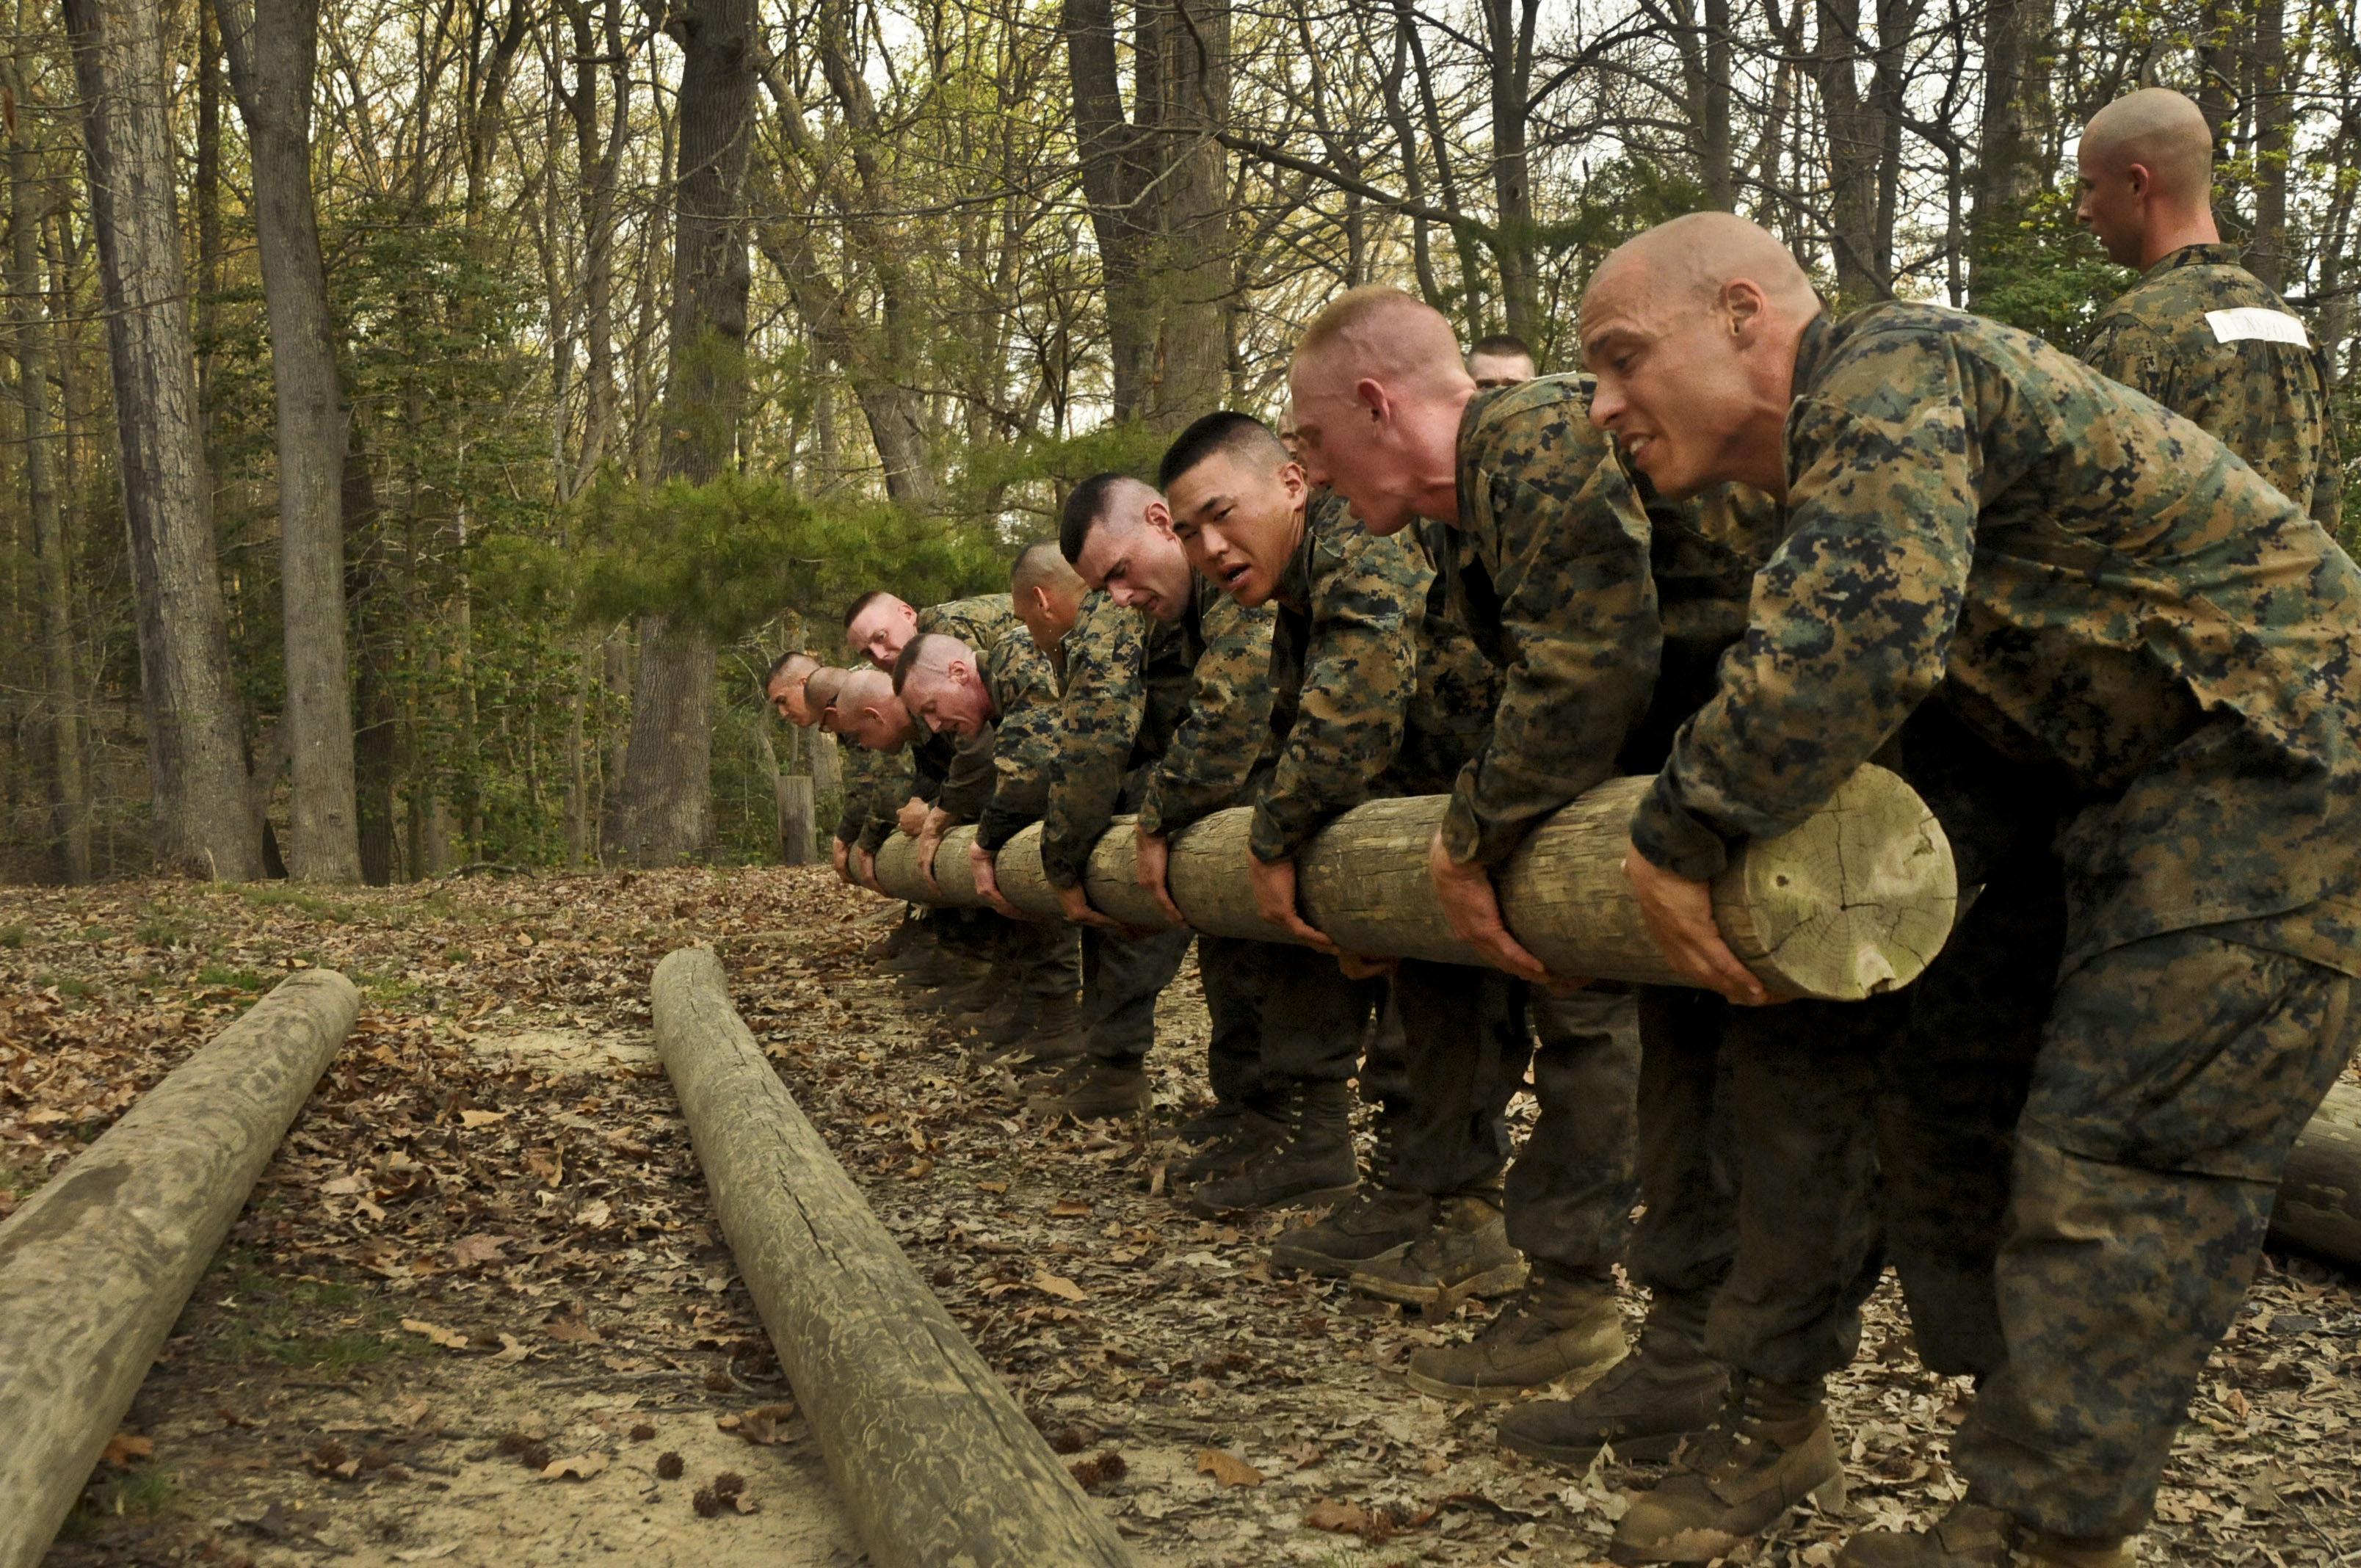 File:Defense.gov News Photo 120324-M-MS992-583 - U.S. Marine Corps ...